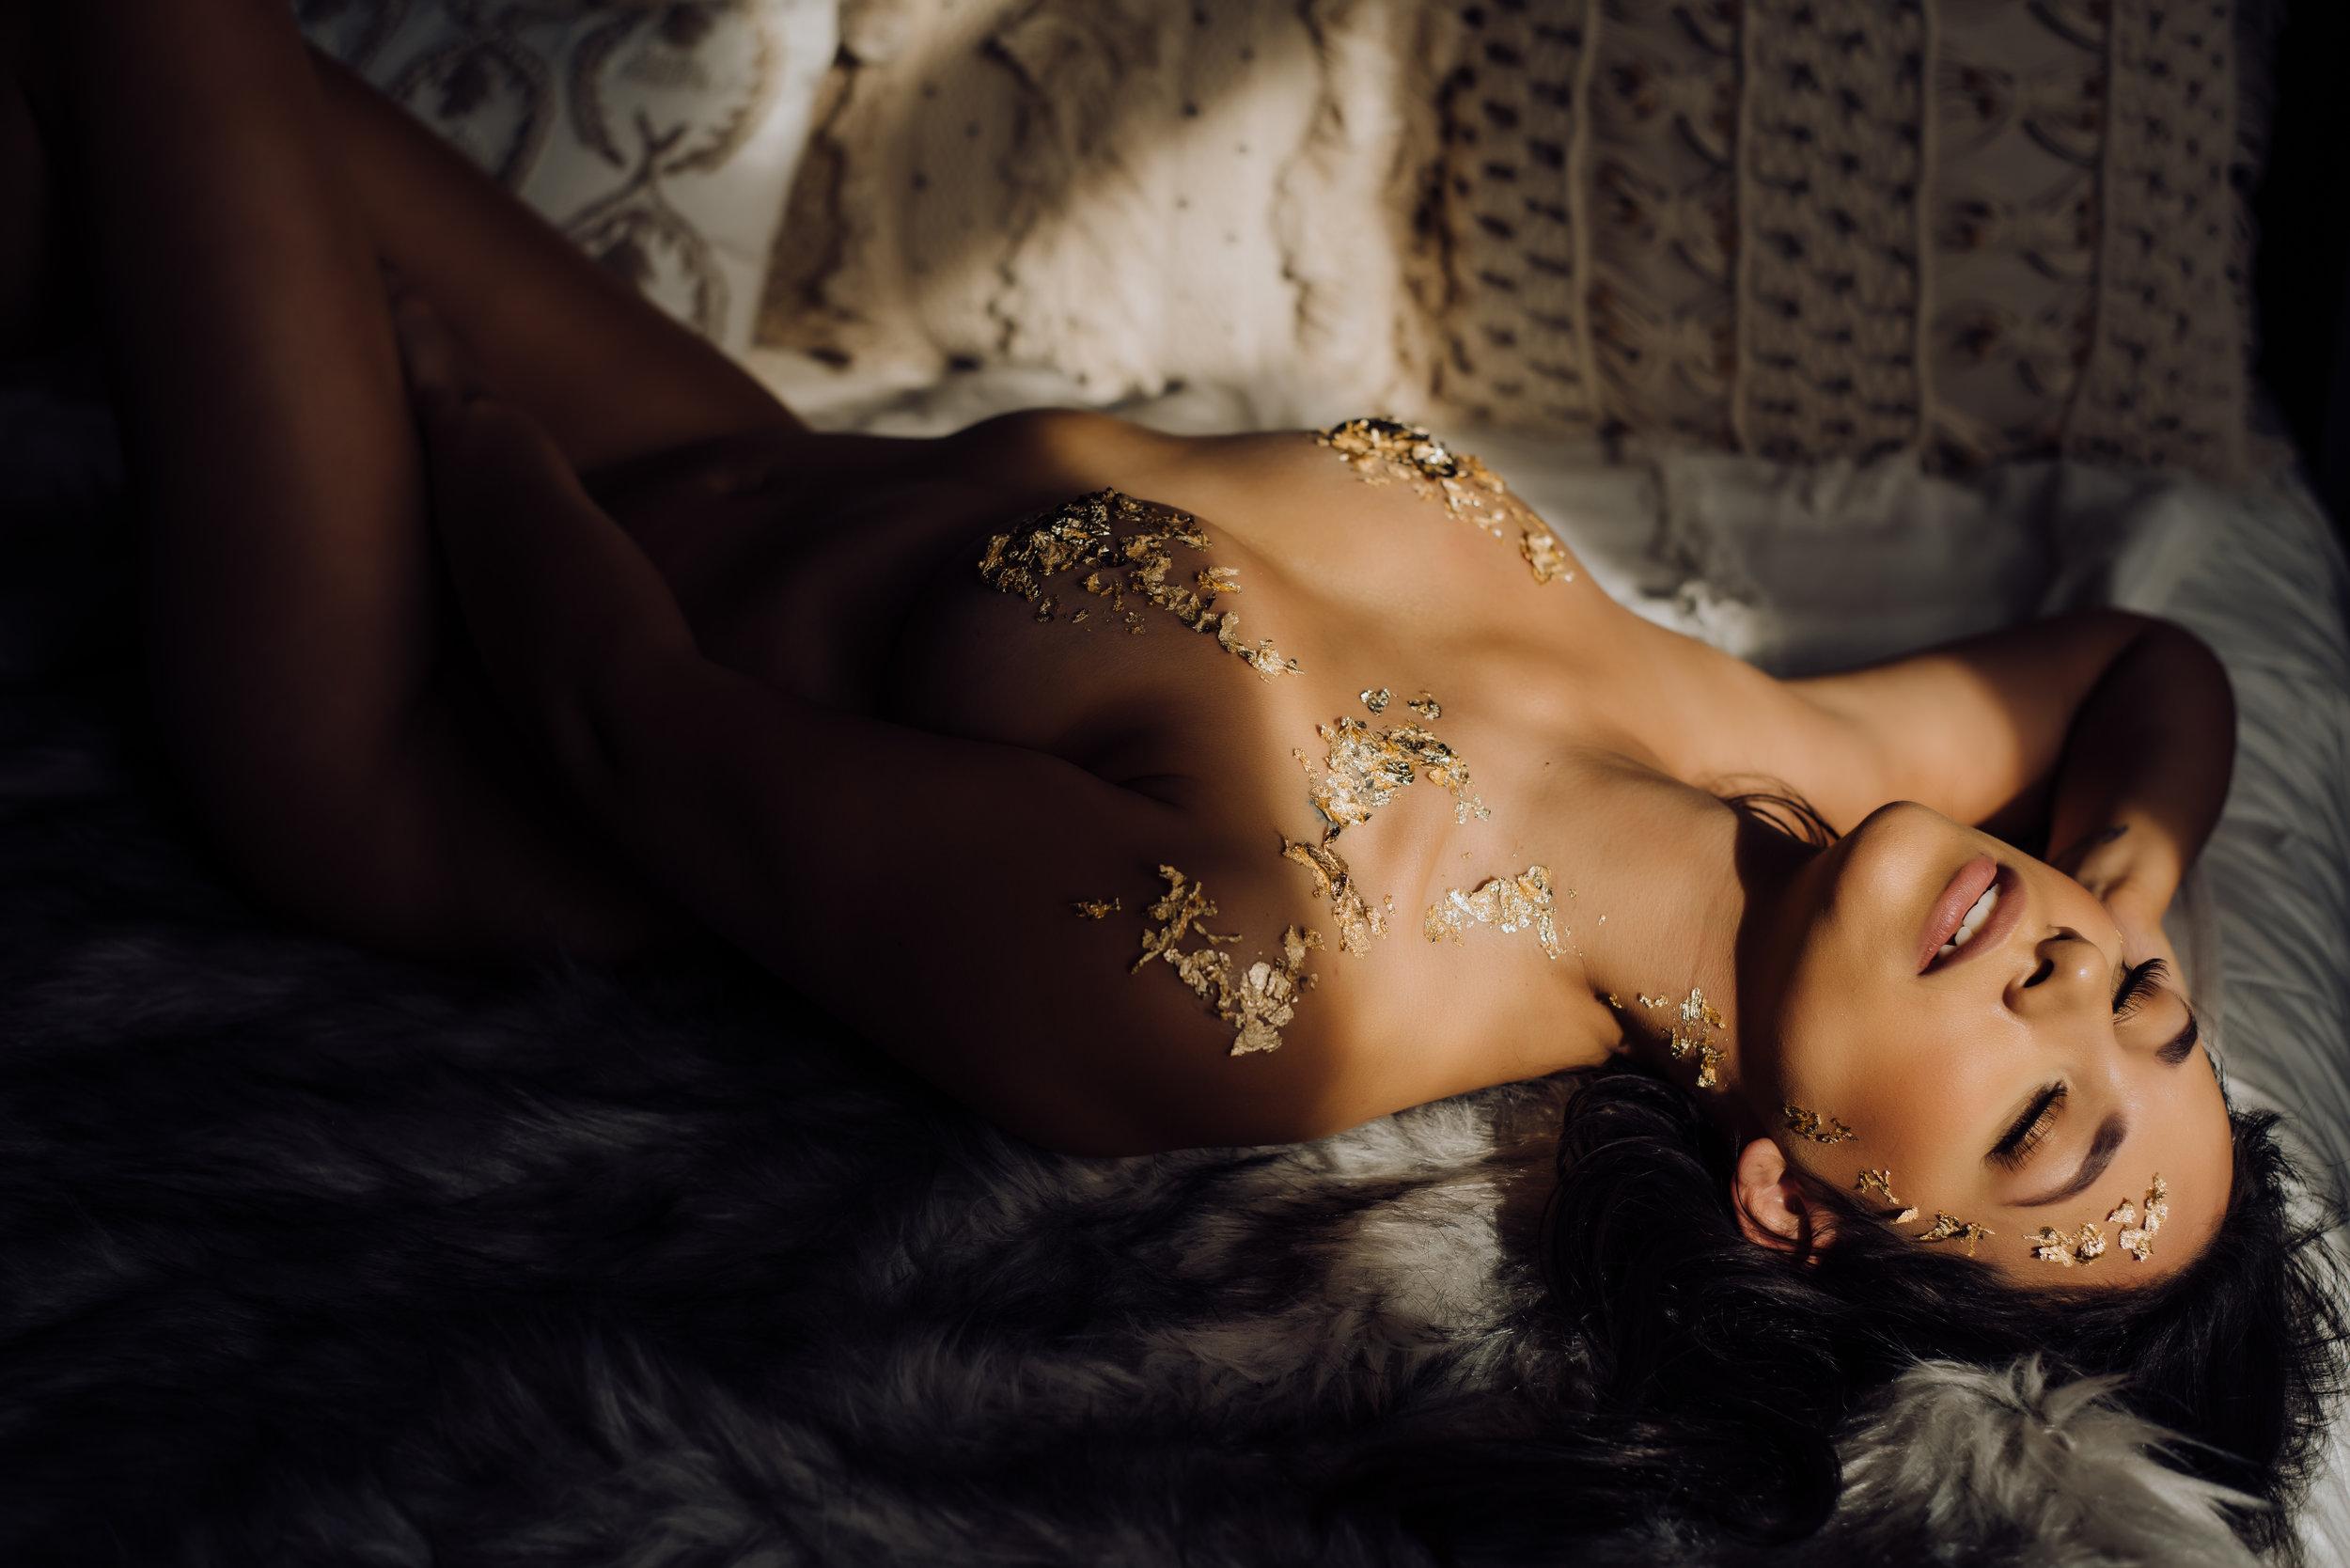 boudoir-photographer-gold-foil-78.jpg